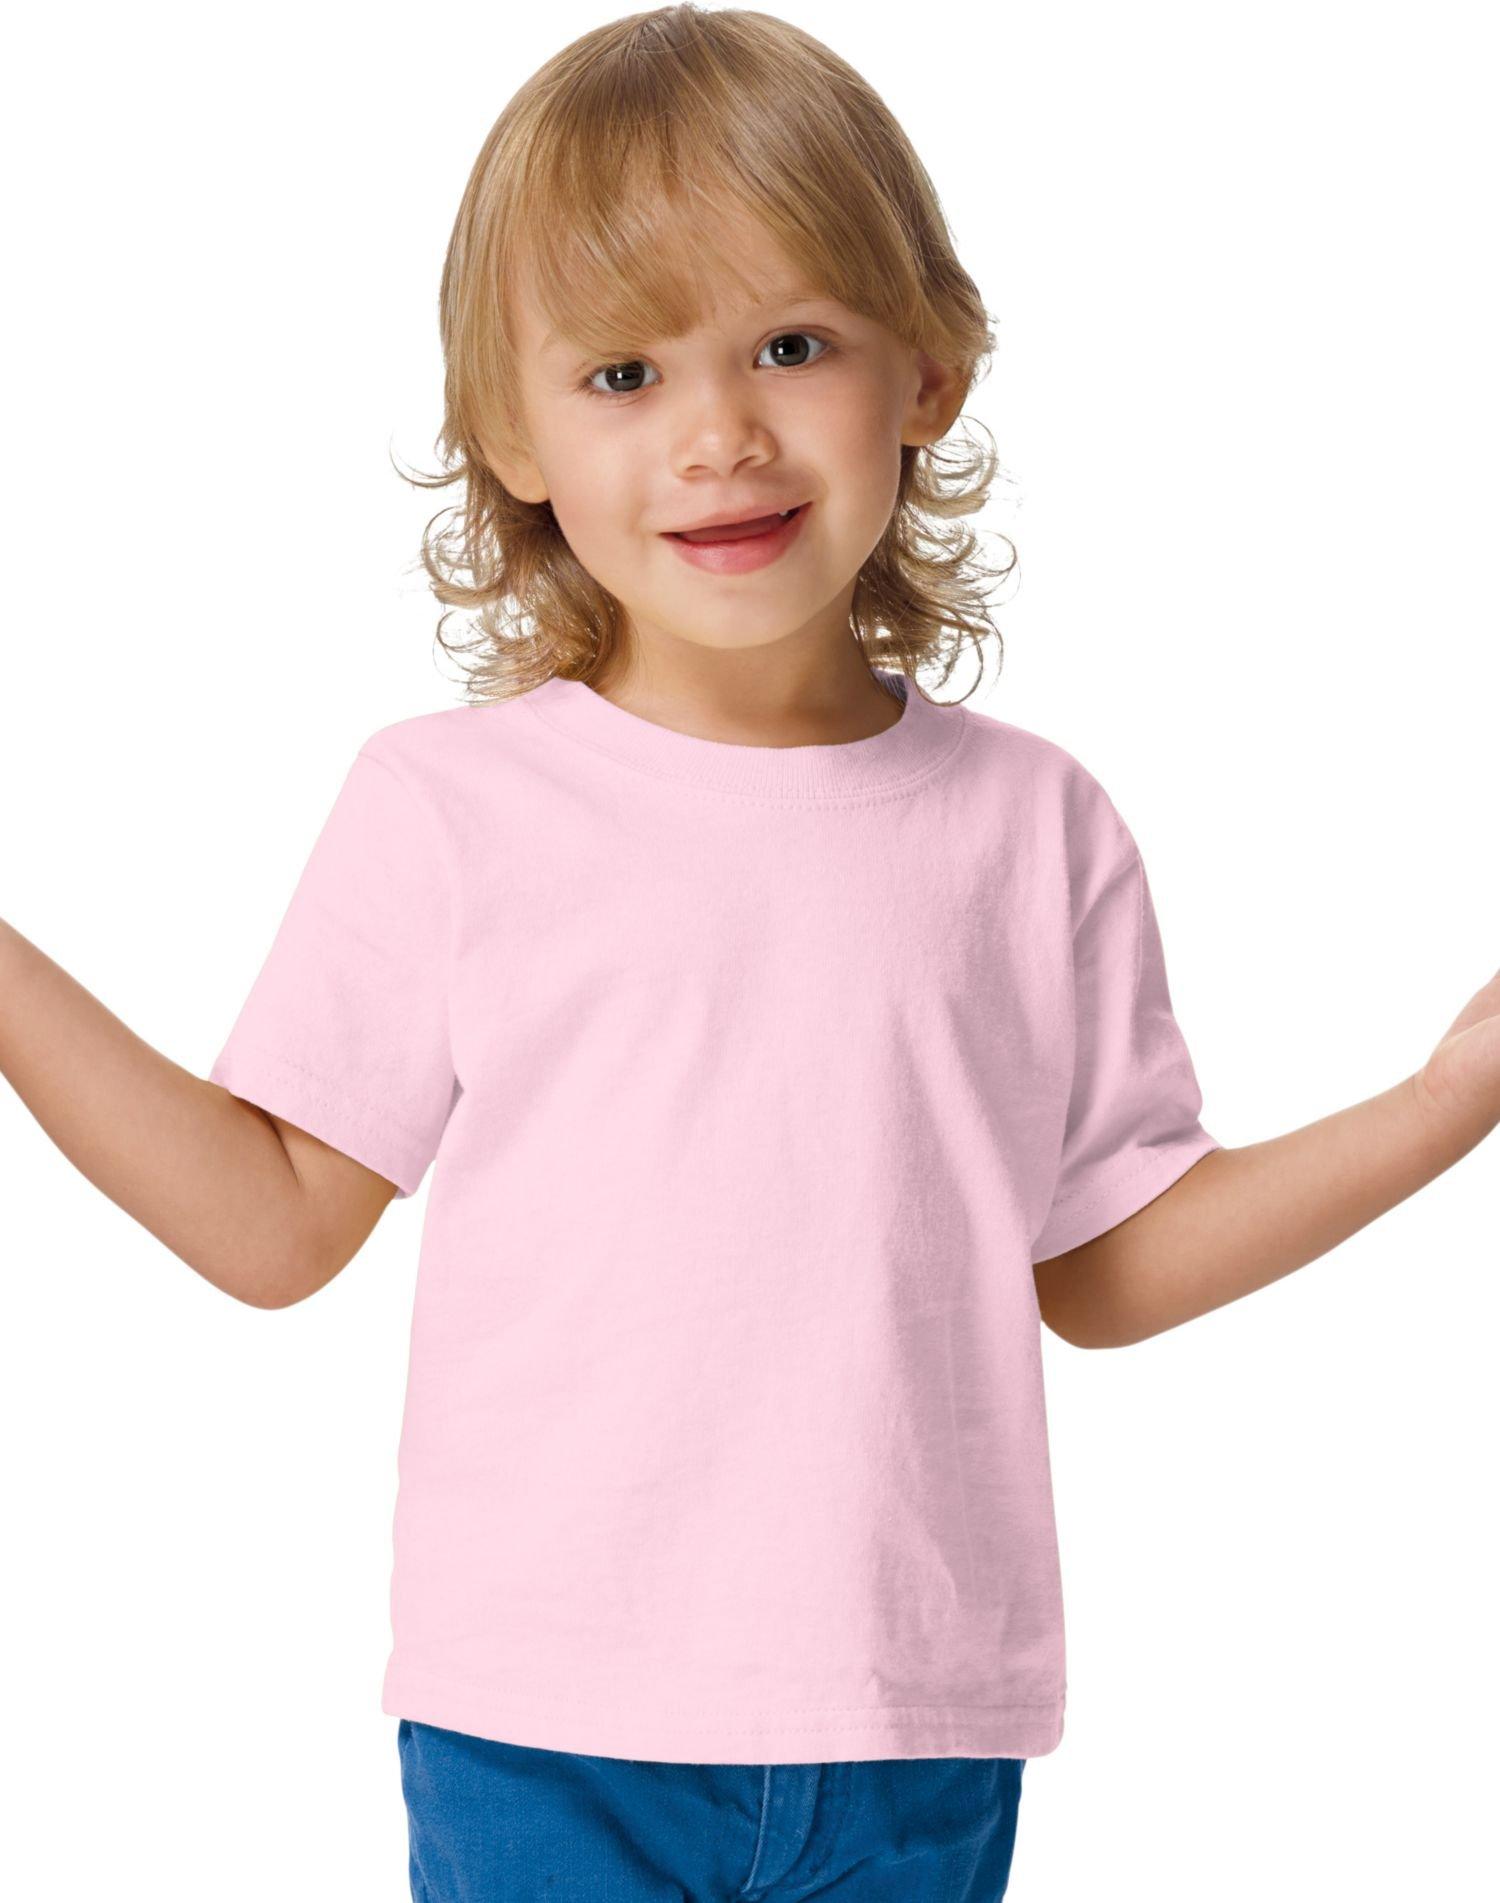 Hanes ComfortSoft Crewneck Toddler T-Shirt, Pale Pink, 4T